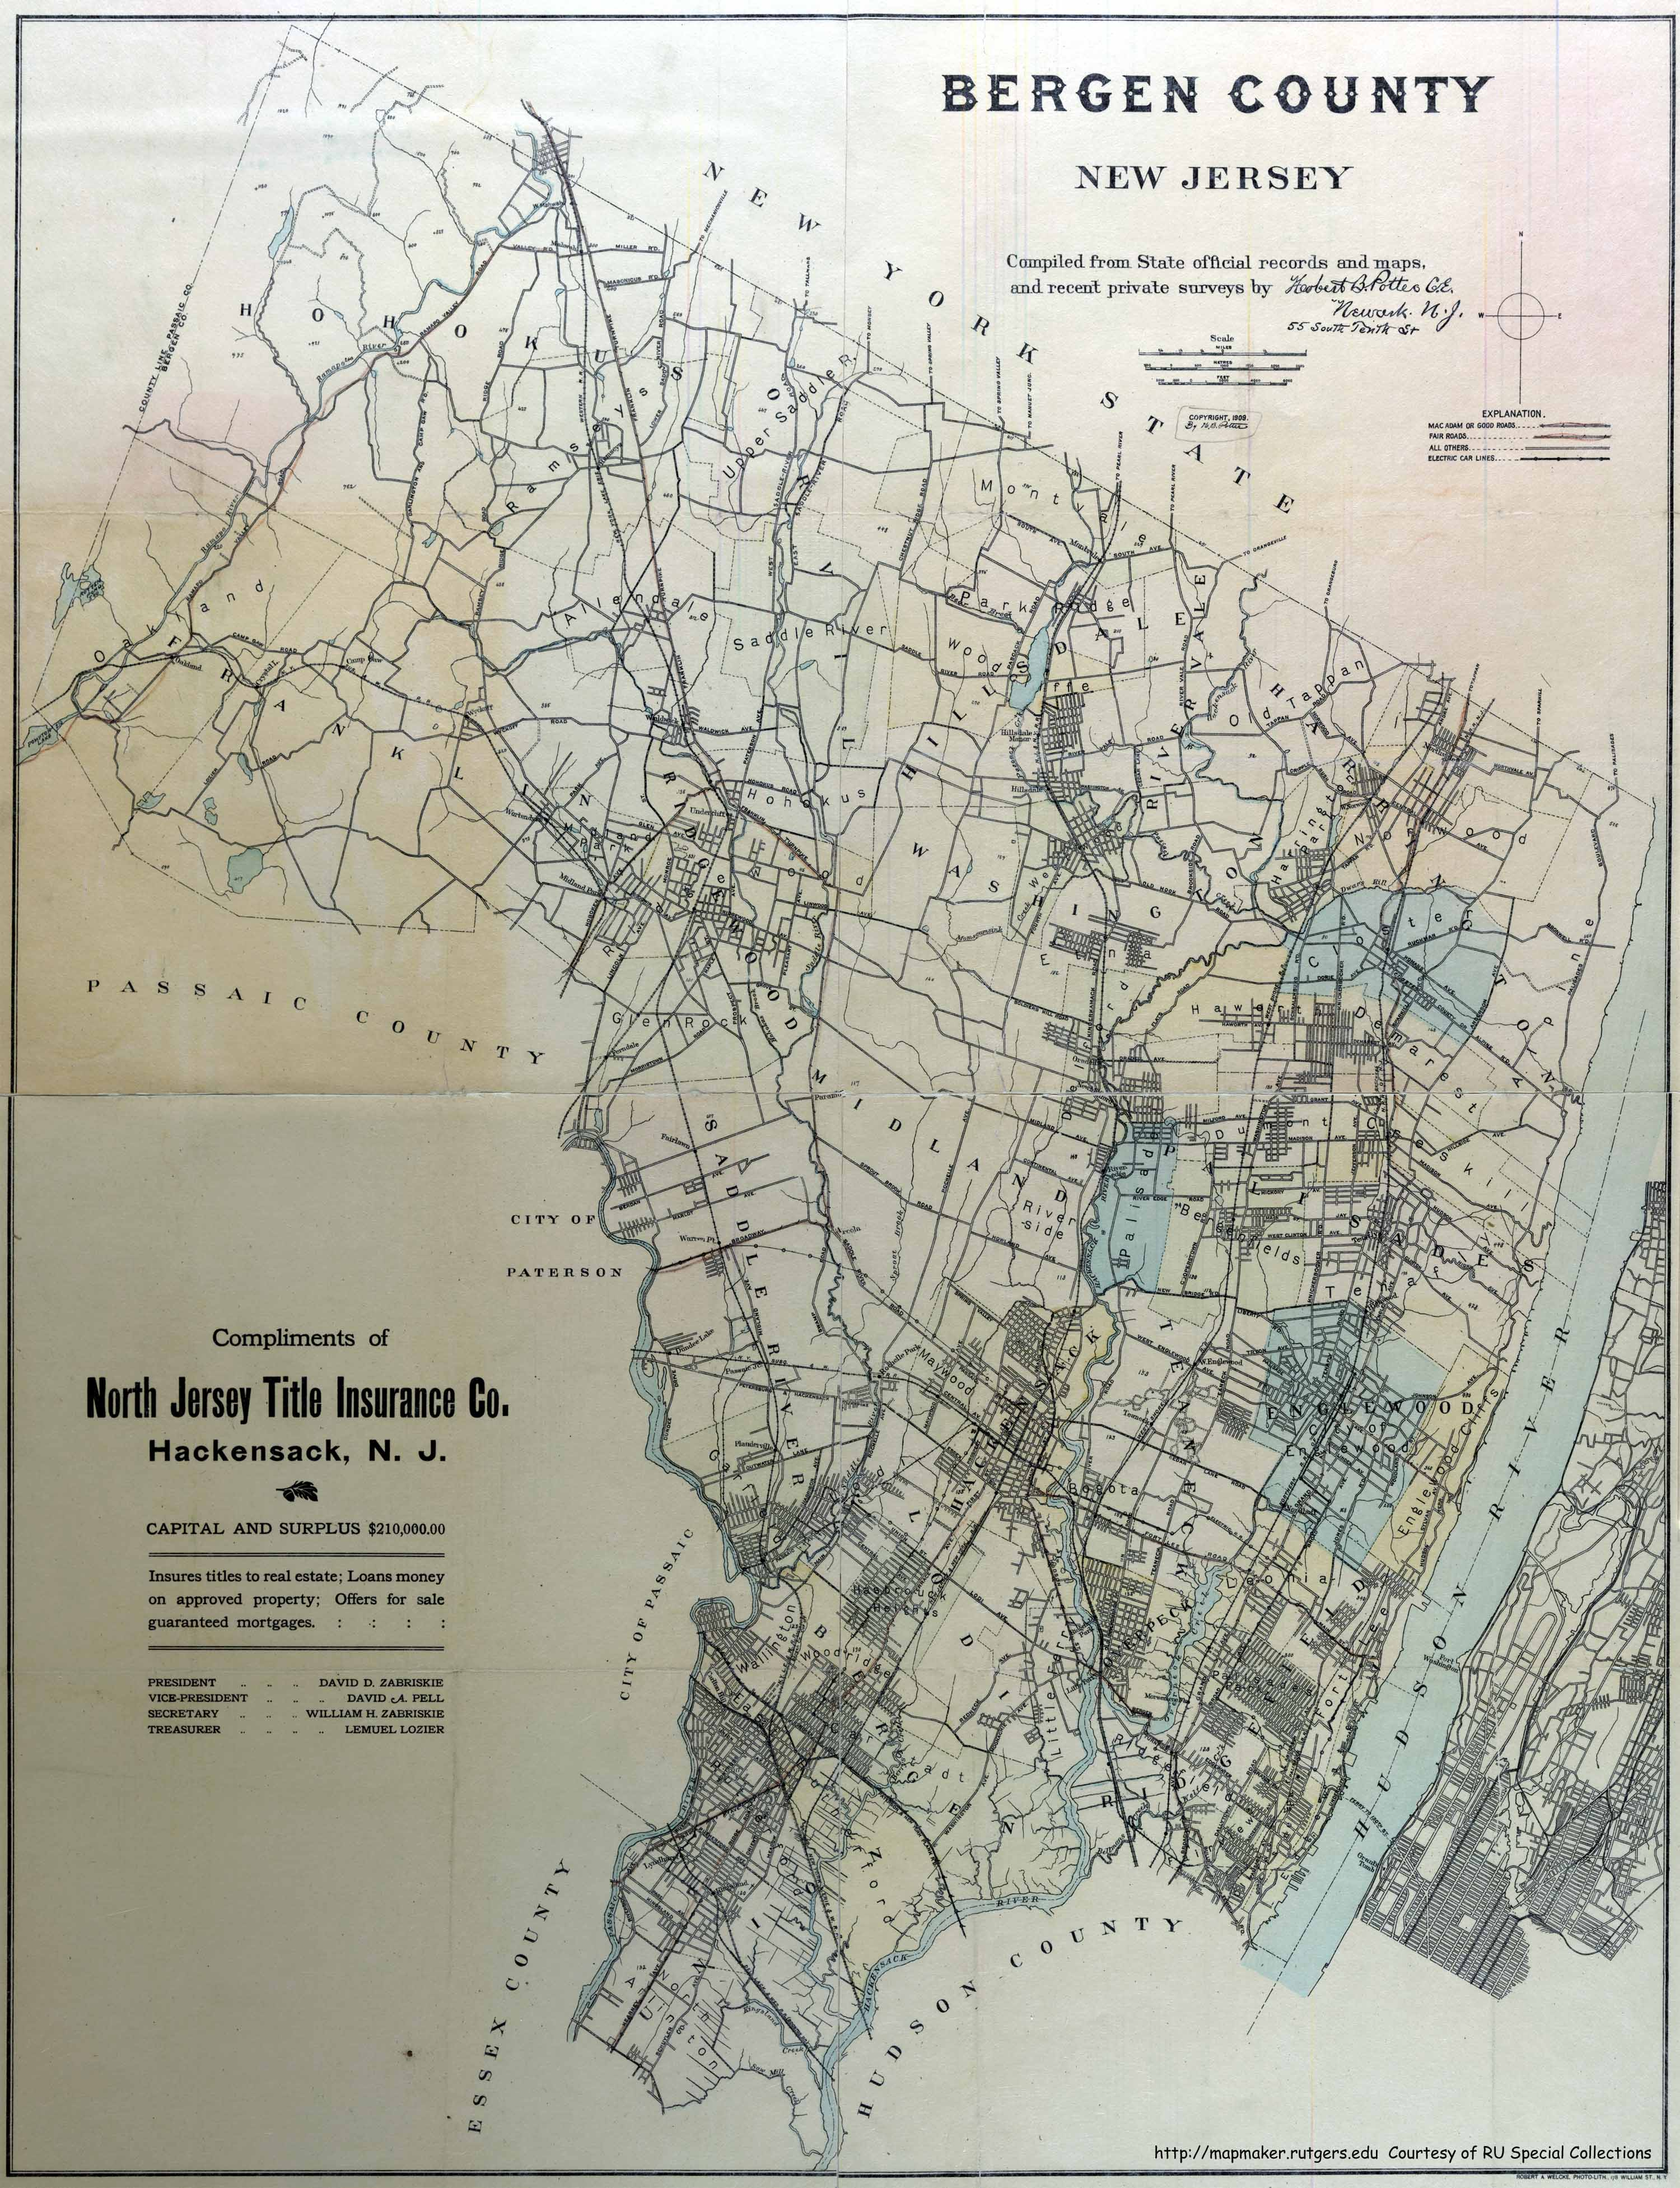 Ridgewood New Jersey Map.Historical Bergen County New Jersey Maps